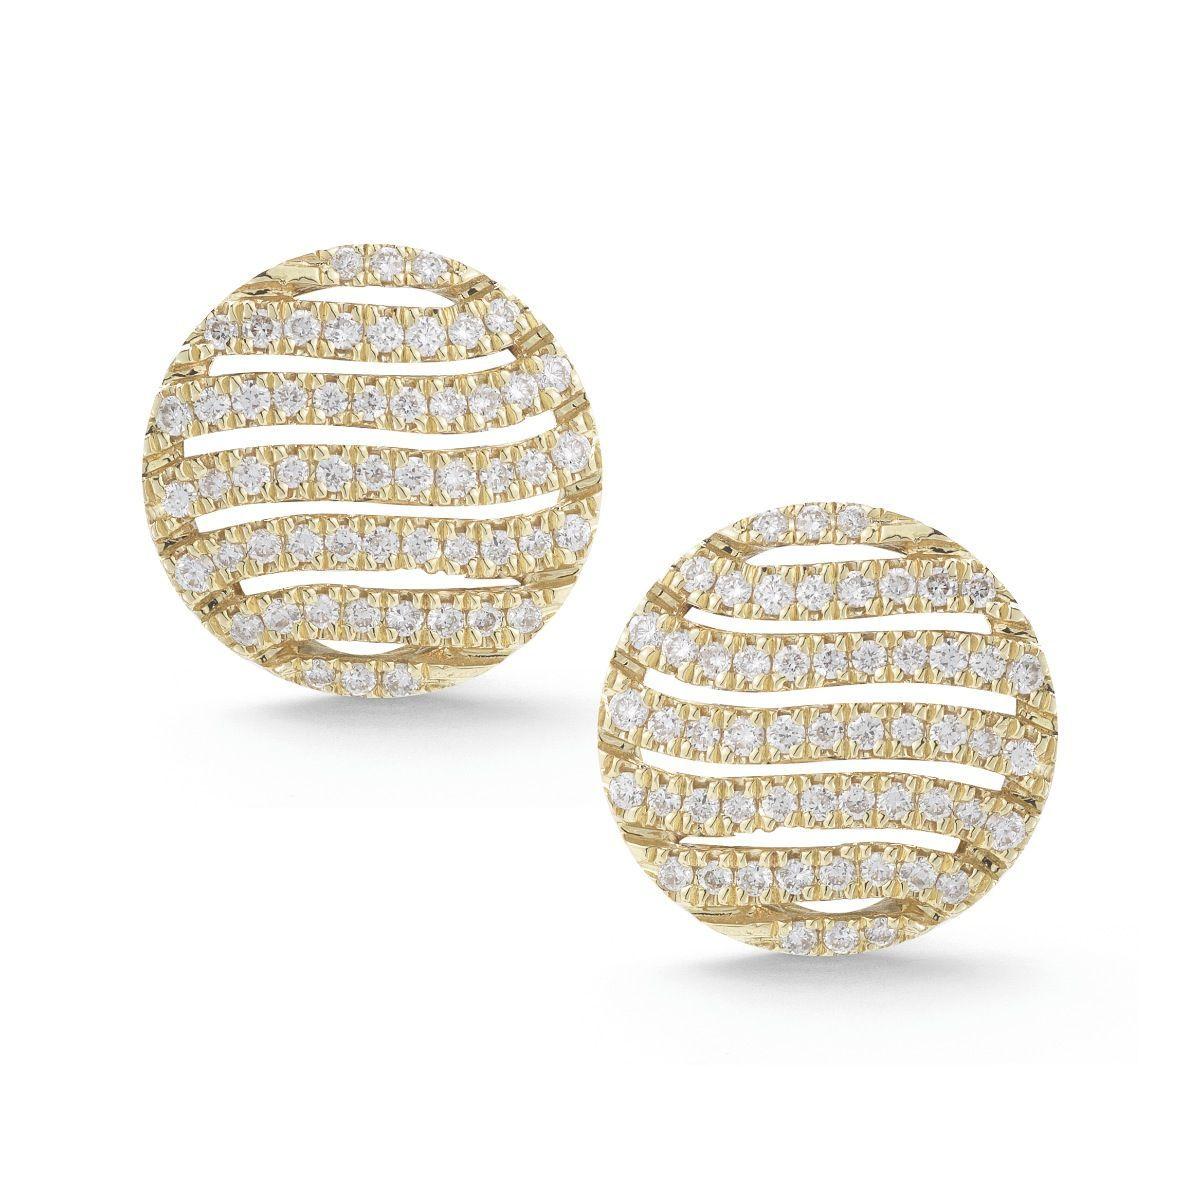 JEB Diamond Disc Studs Studs Earrings Dana Rebecca Designs